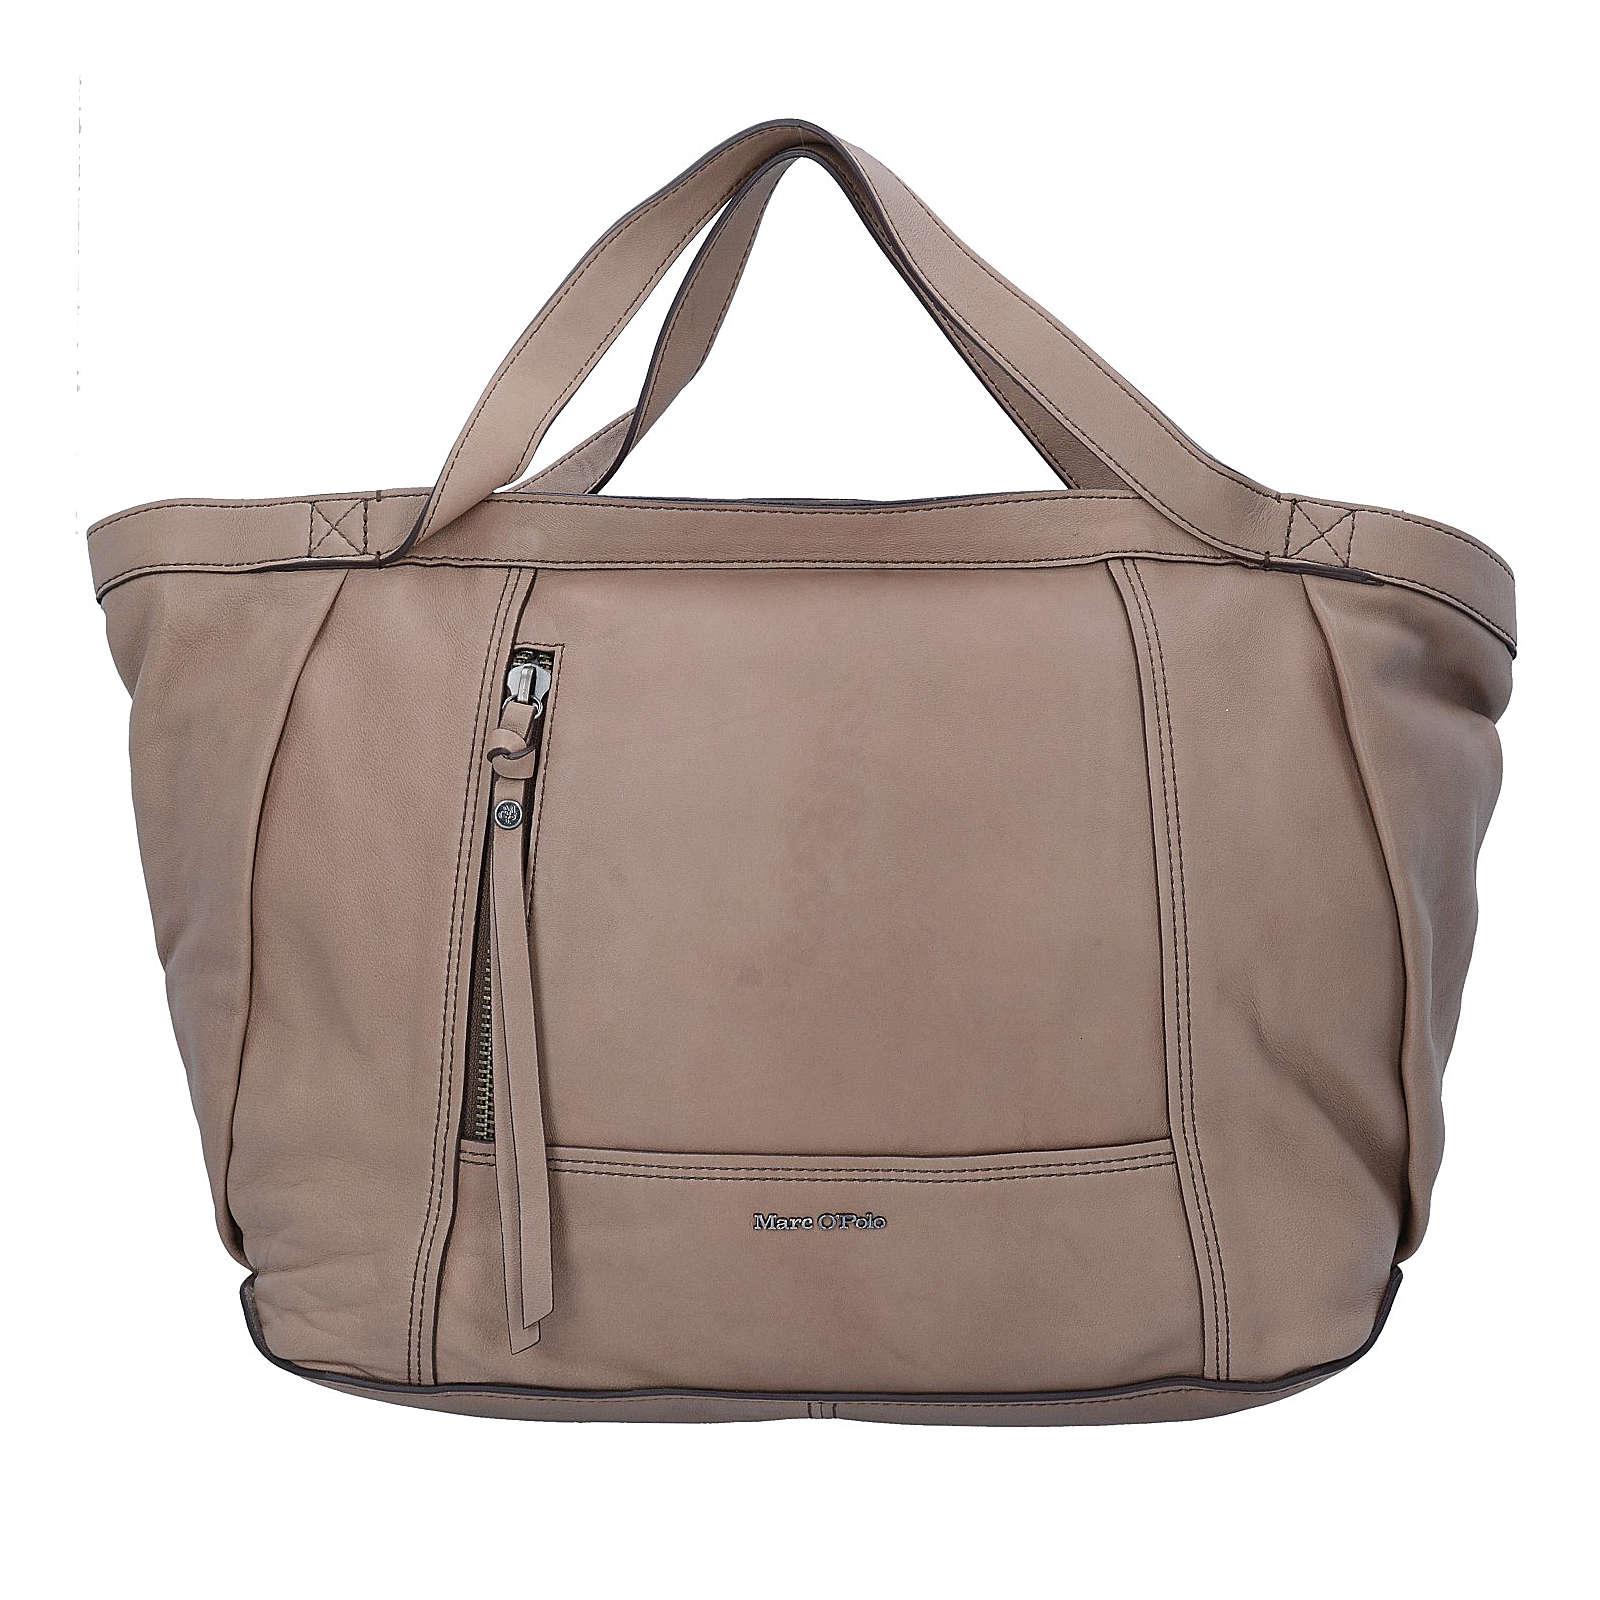 Loana L Shopper Tasche Leder 40 cm Marc O´Polo taupe jetztbilligerkaufen